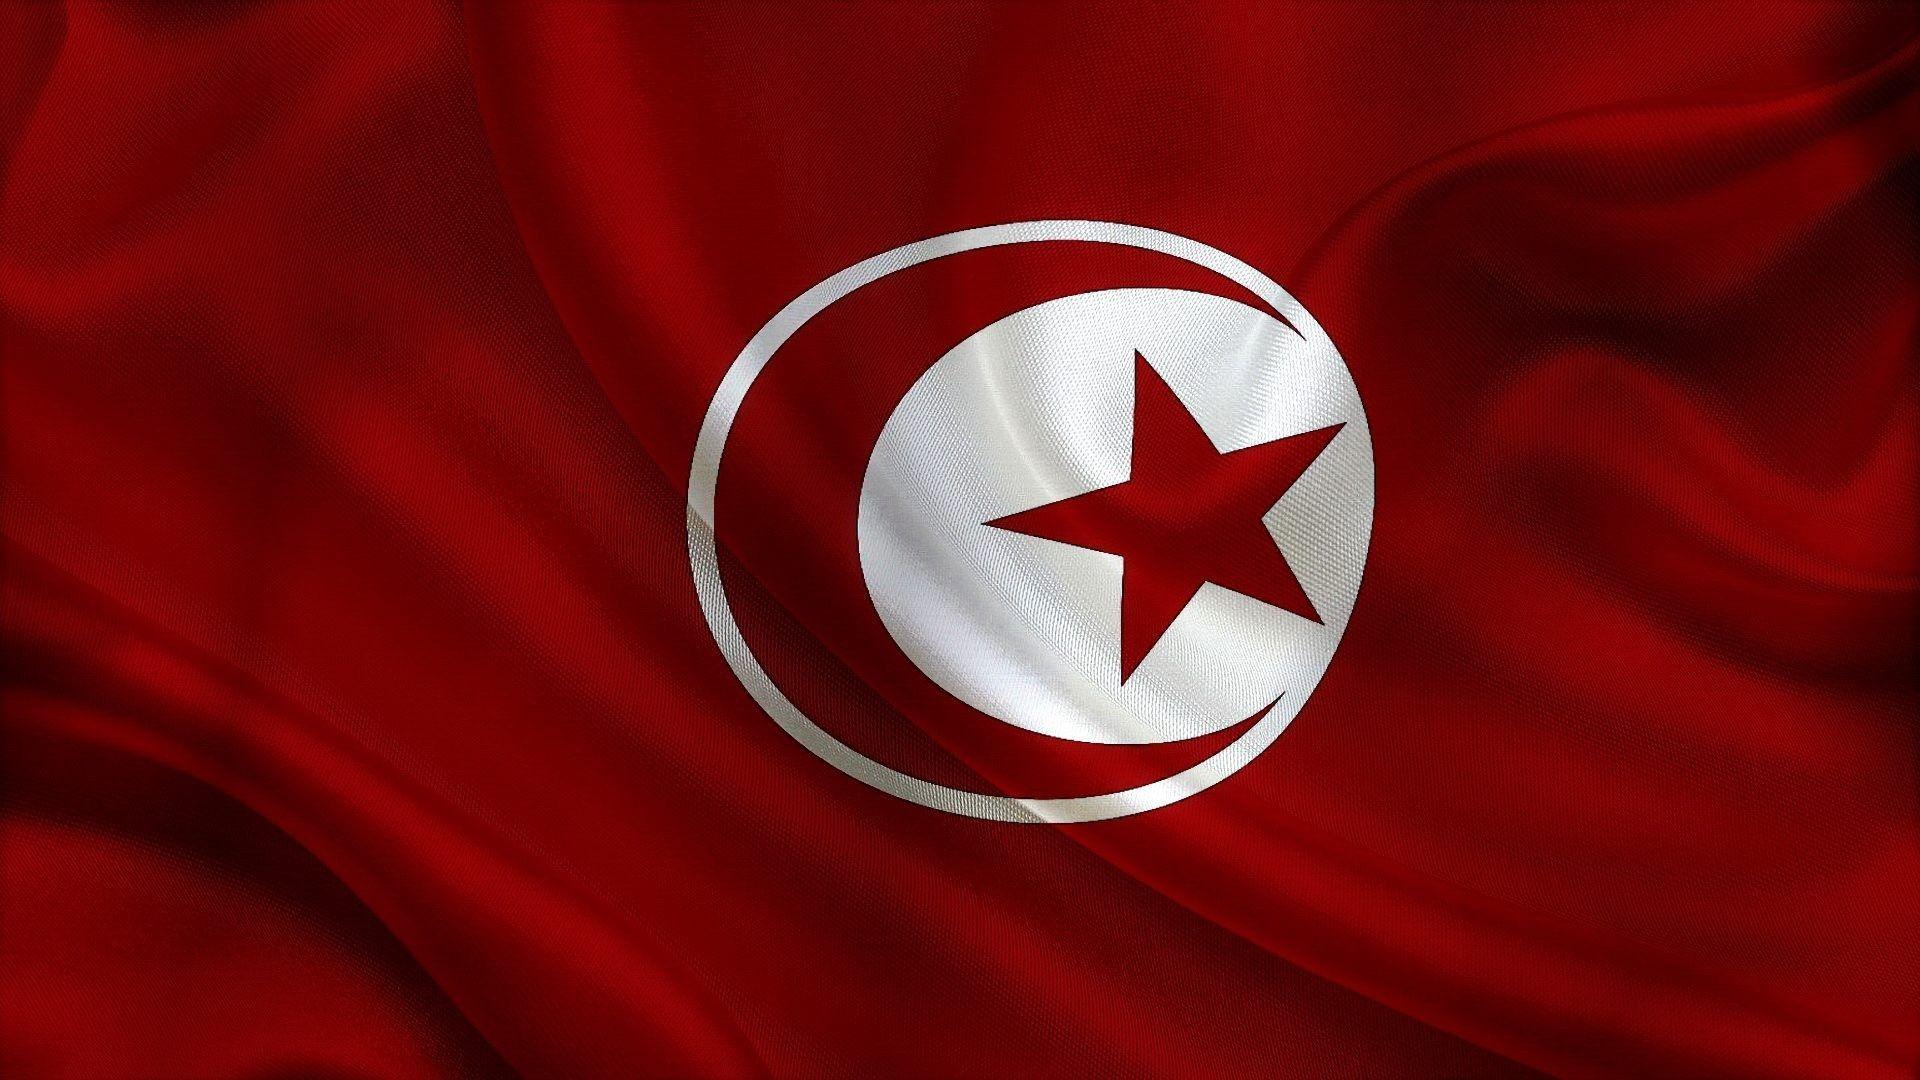 Tunisia Flag wallpaper